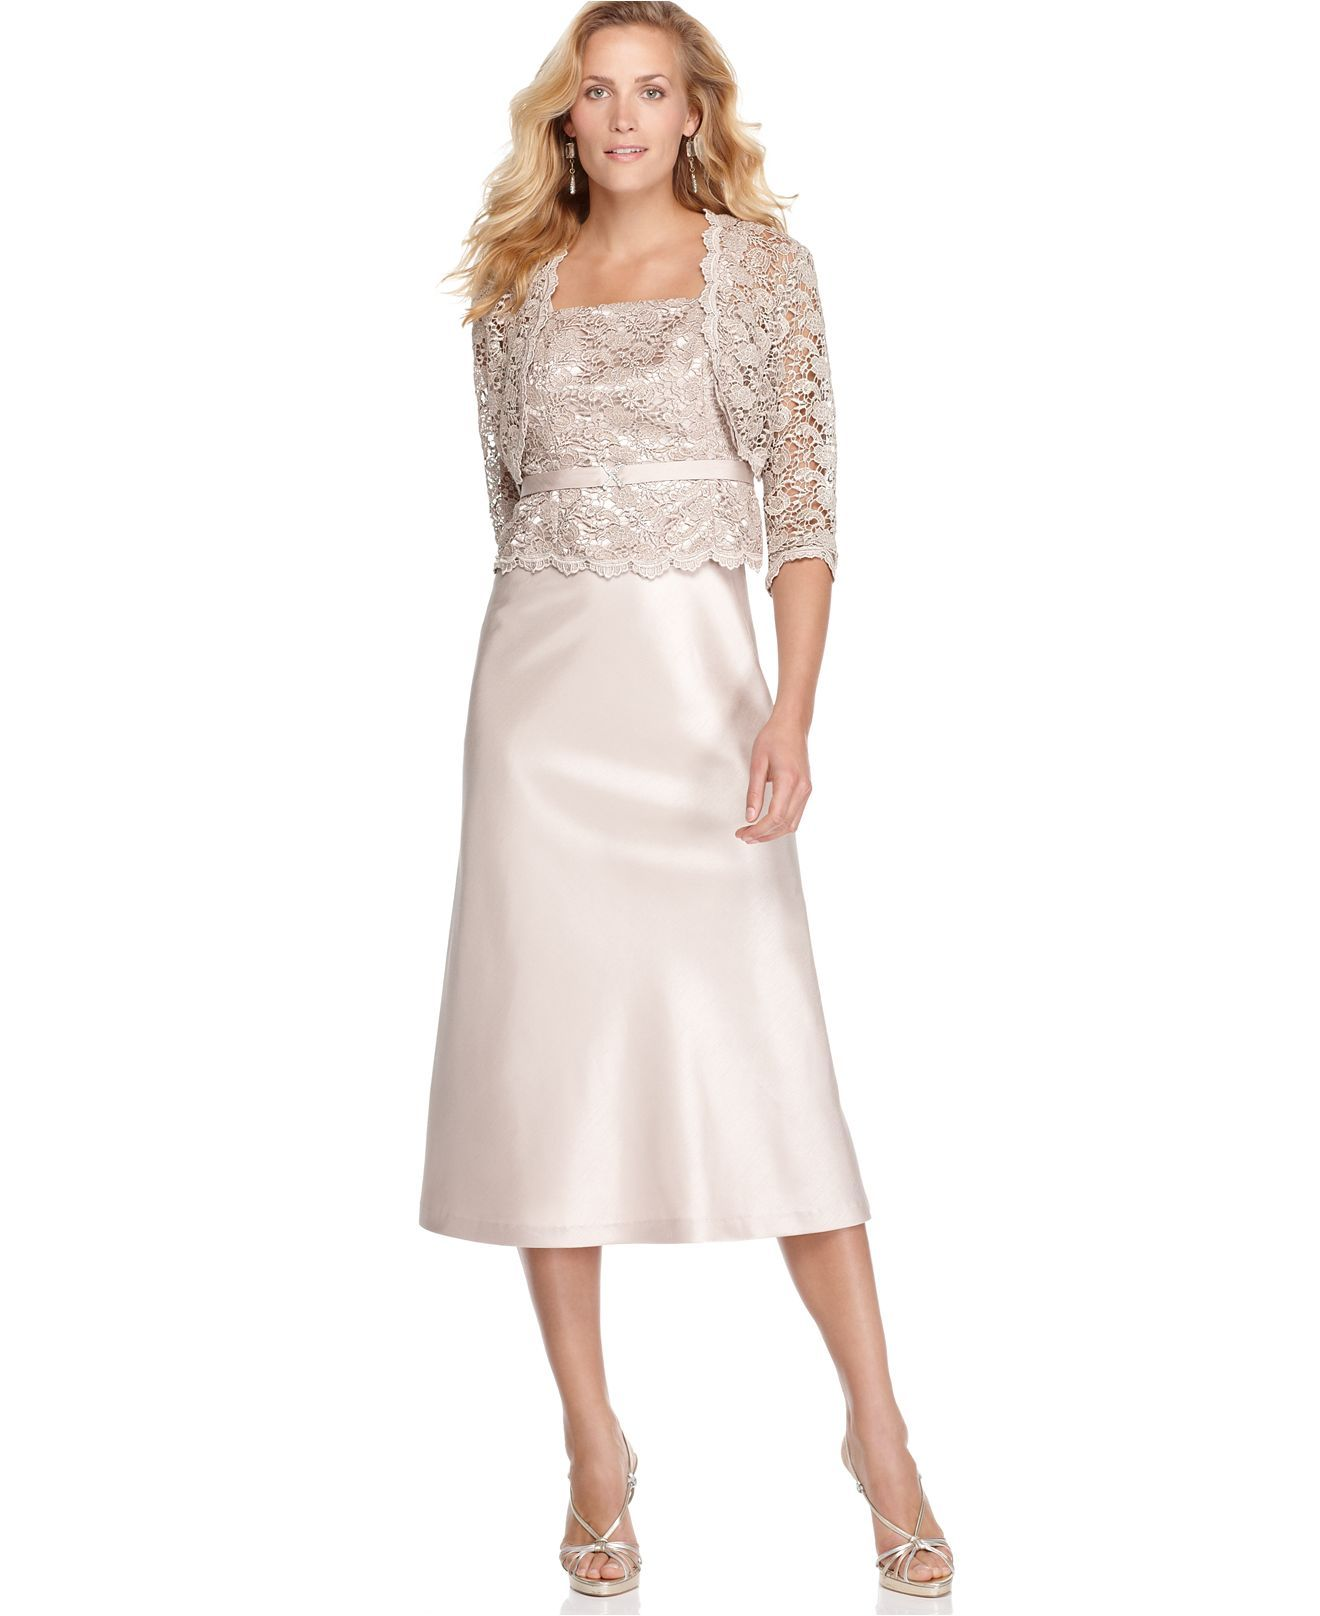 Macy's party dresses weddings   RuM Richards Dress and Jacket Sleeveless Lace Bodice Evening